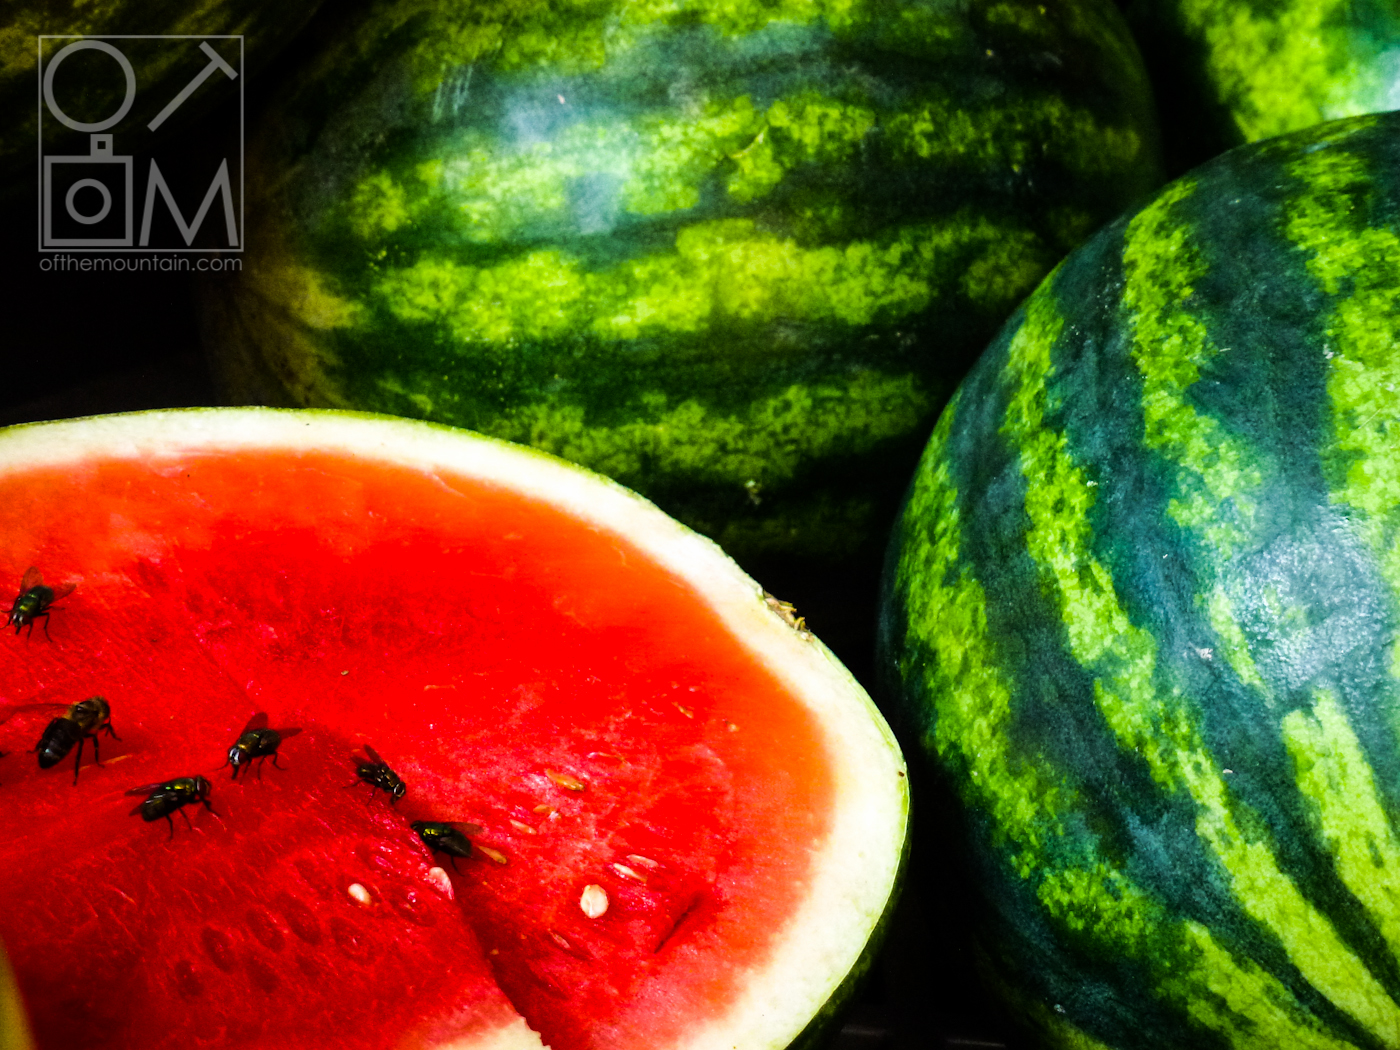 Philly - Italian Market - Watermelons